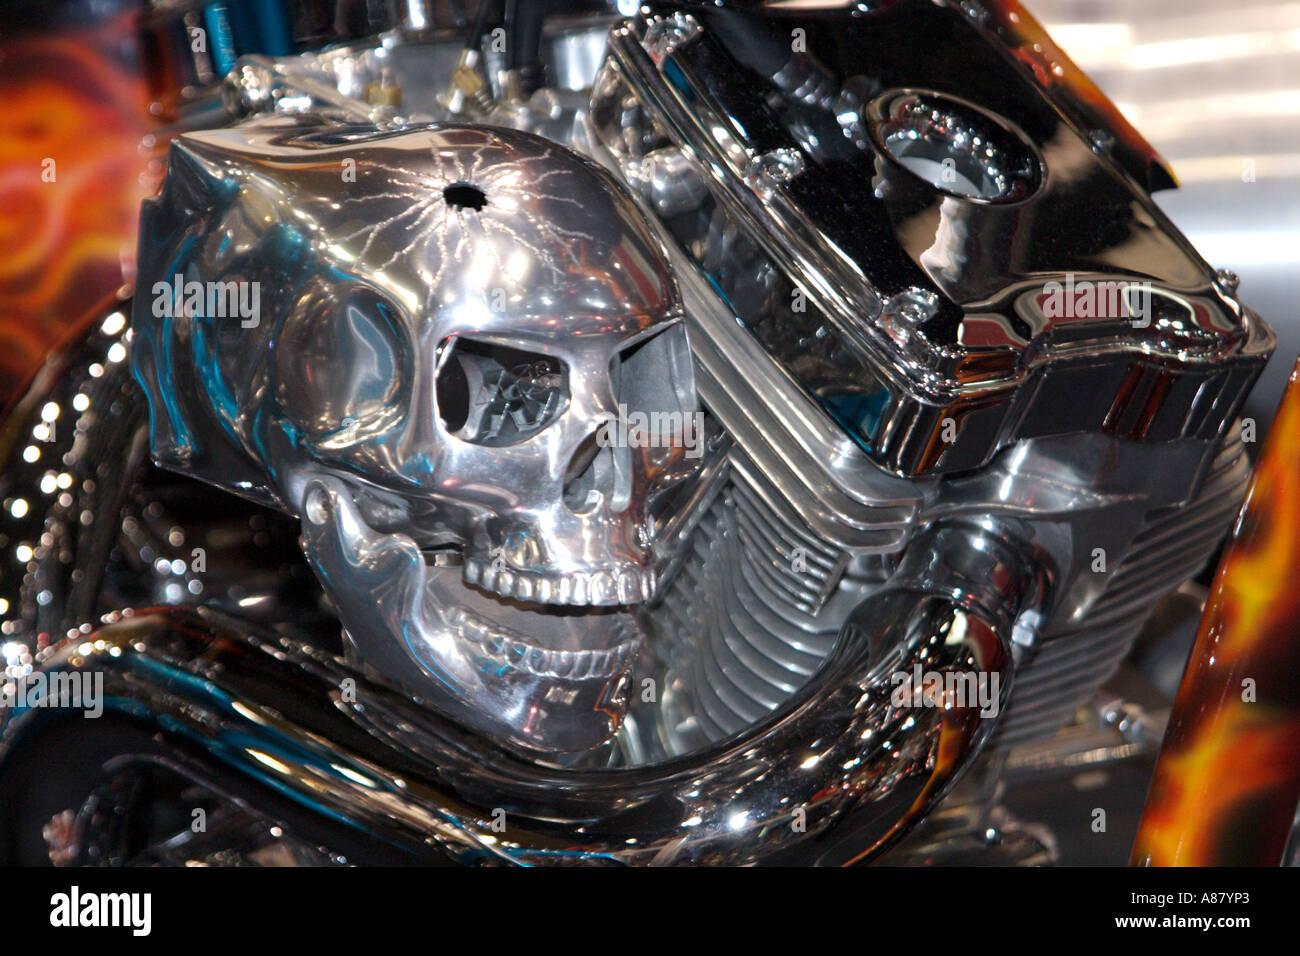 totenkopf auf harley davidson motorrad bapdb6587 stockfoto. Black Bedroom Furniture Sets. Home Design Ideas